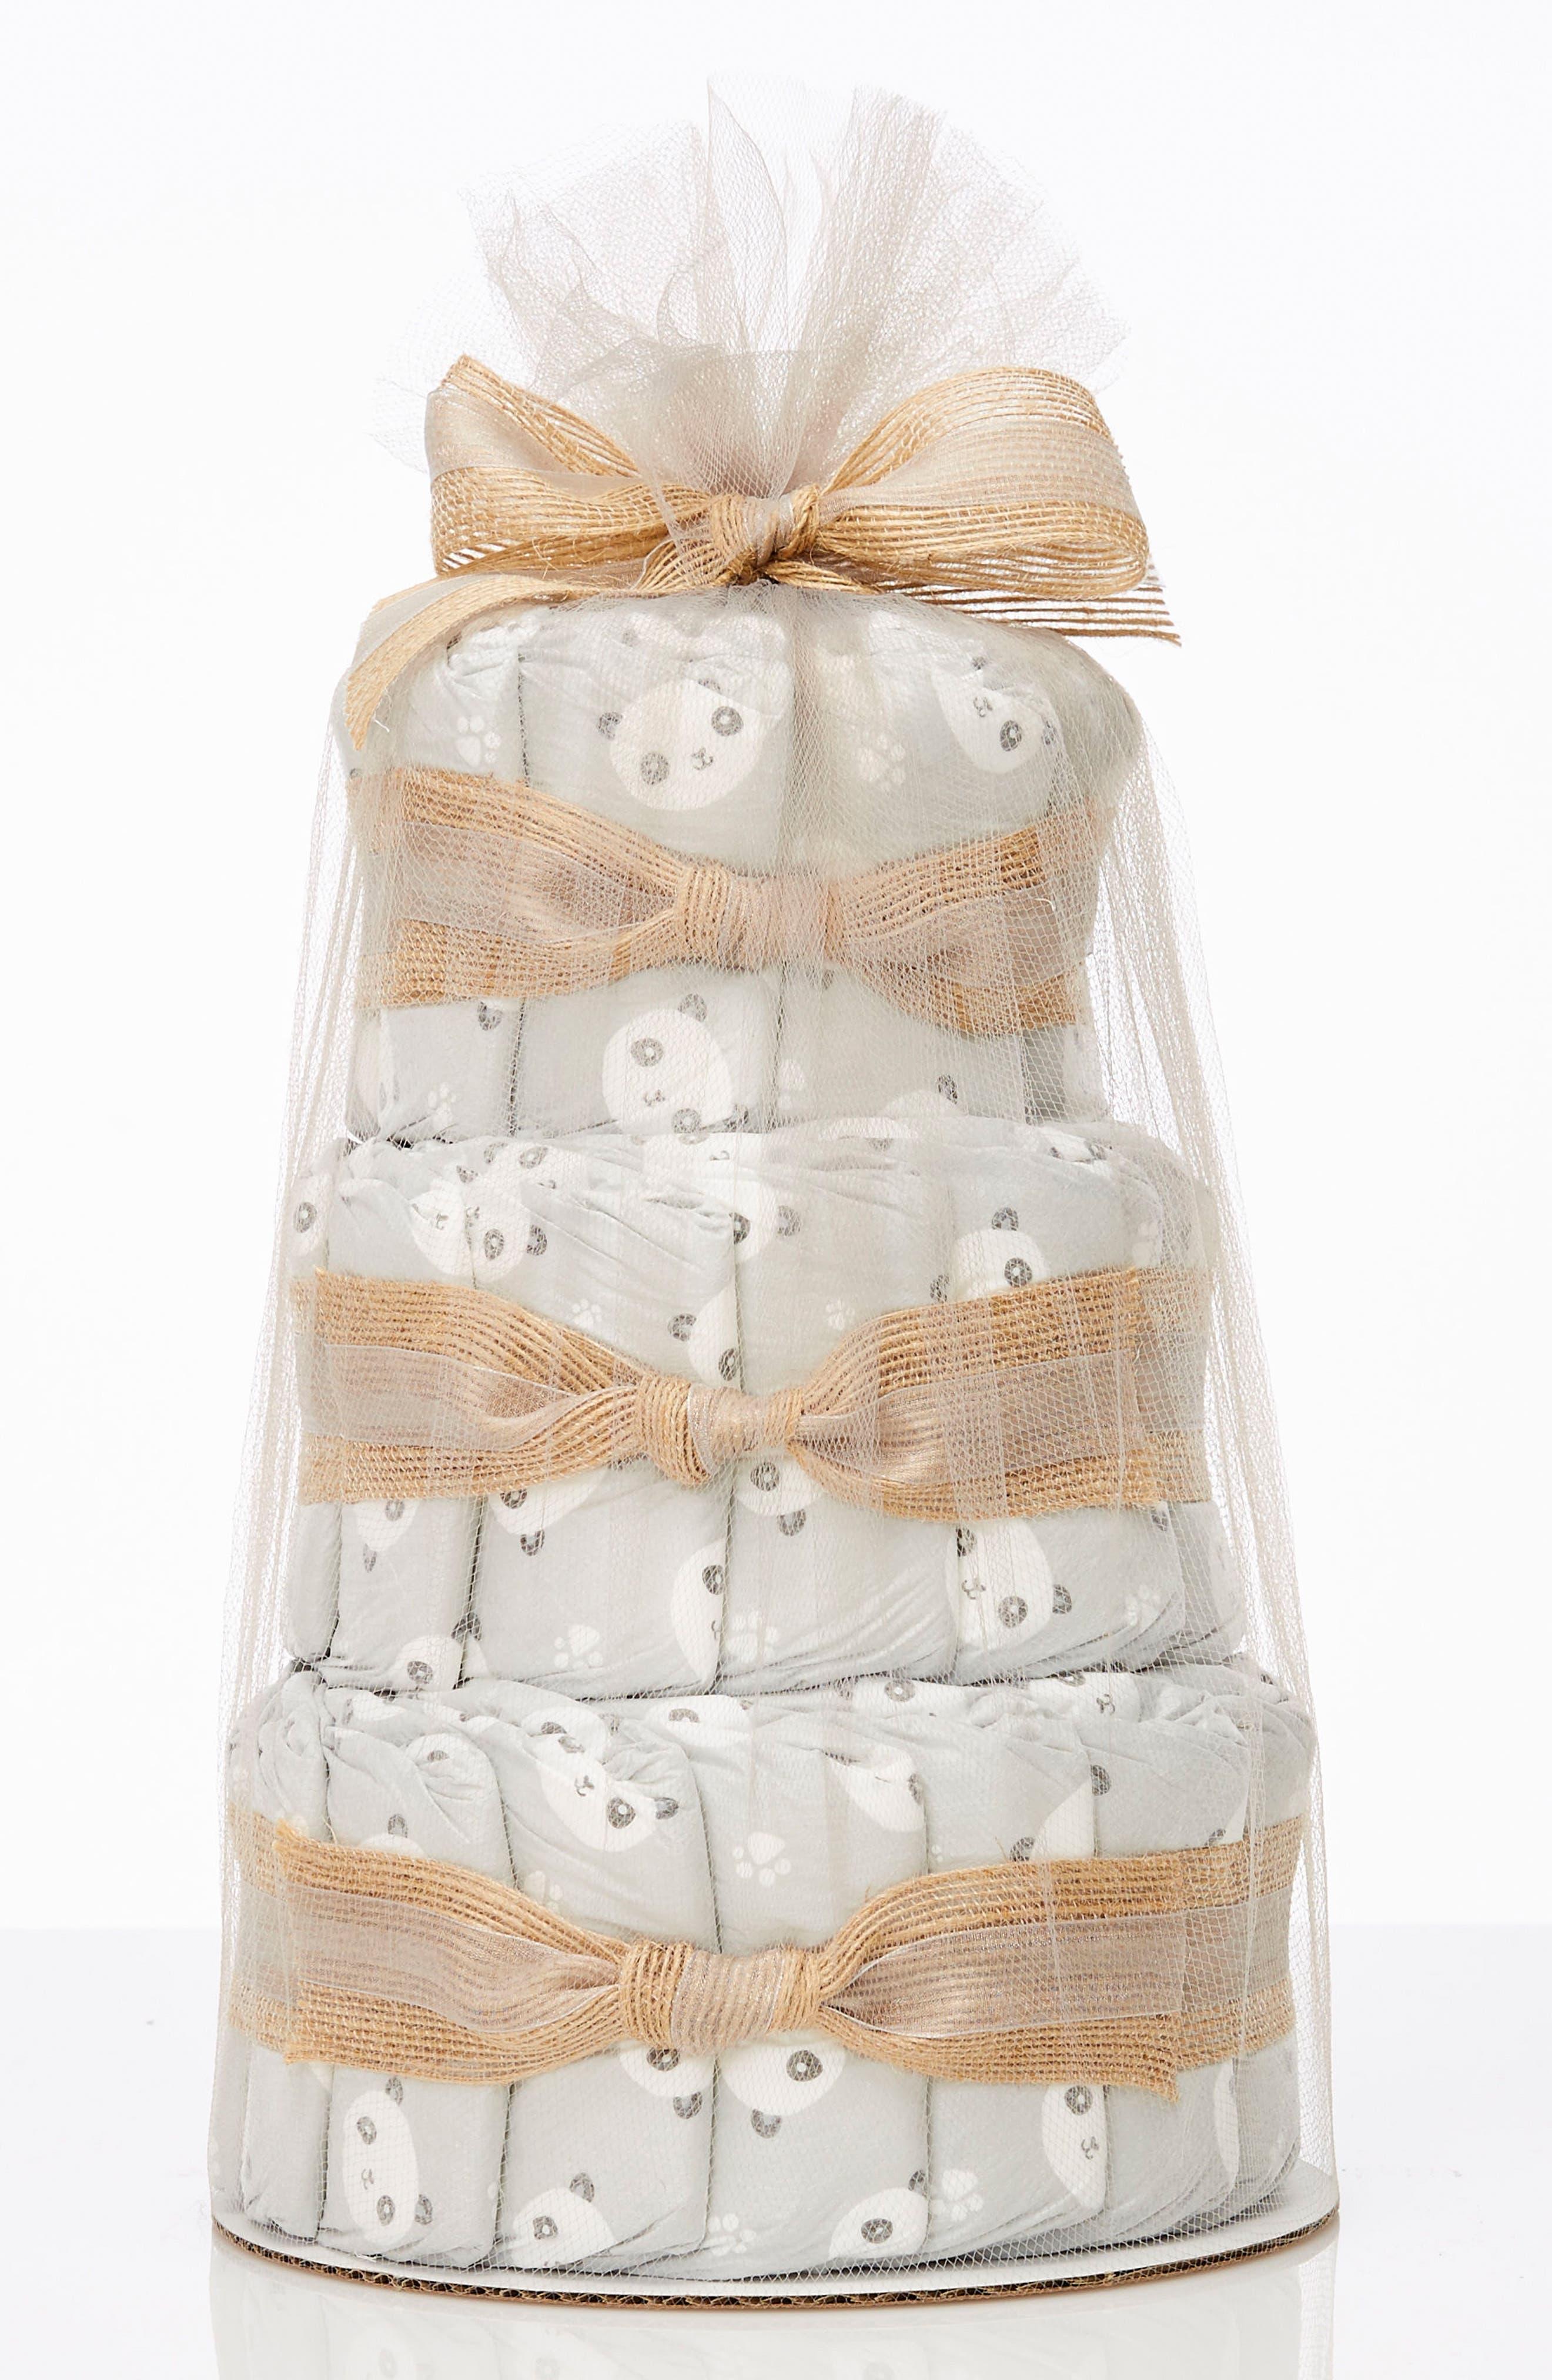 THE HONEST COMPANY Mini Diaper Cake & Travel-Size Essentials Set, Main, color, PANDAS